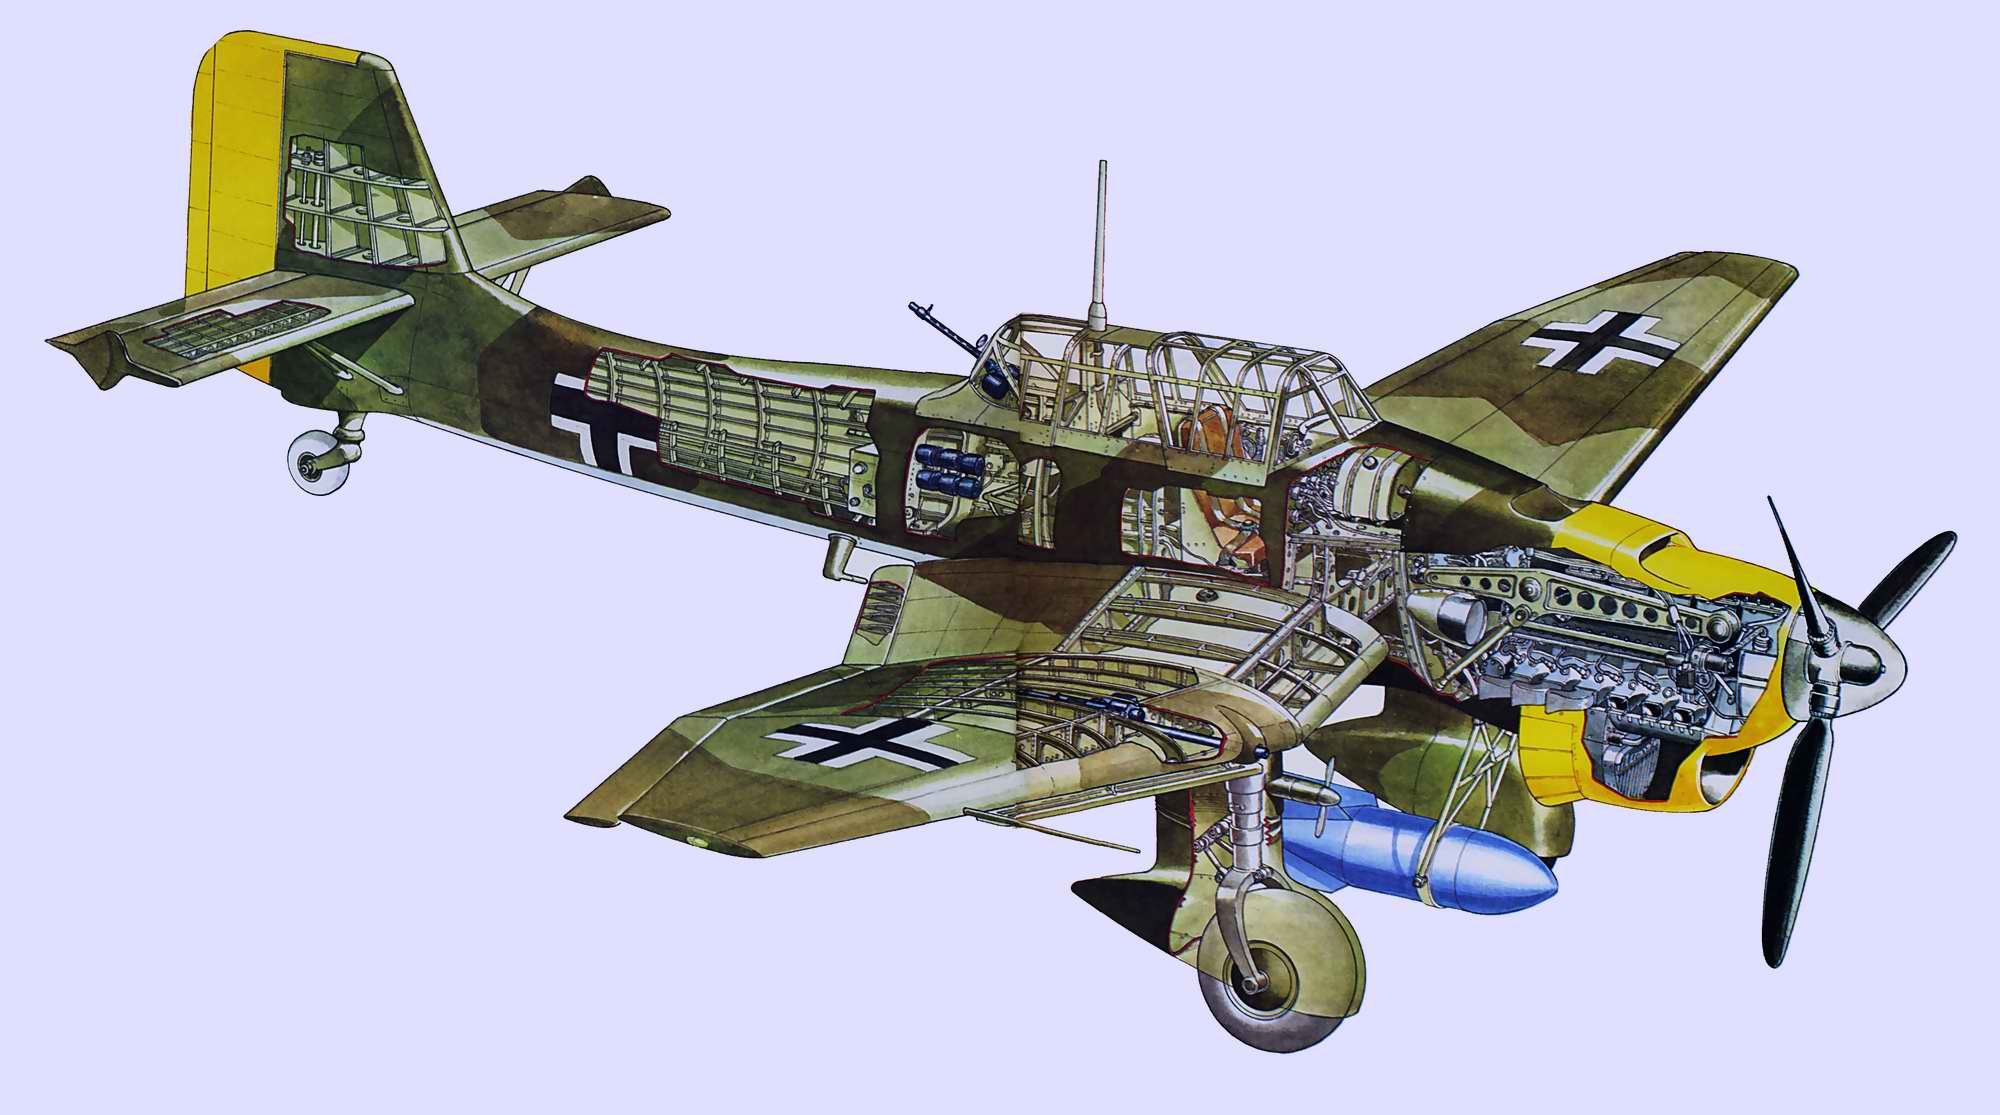 Junkers Ju 87 - пикирующий бомбардировщик Юнкерс Ю-87 Штука, 1936 год  (Германия)